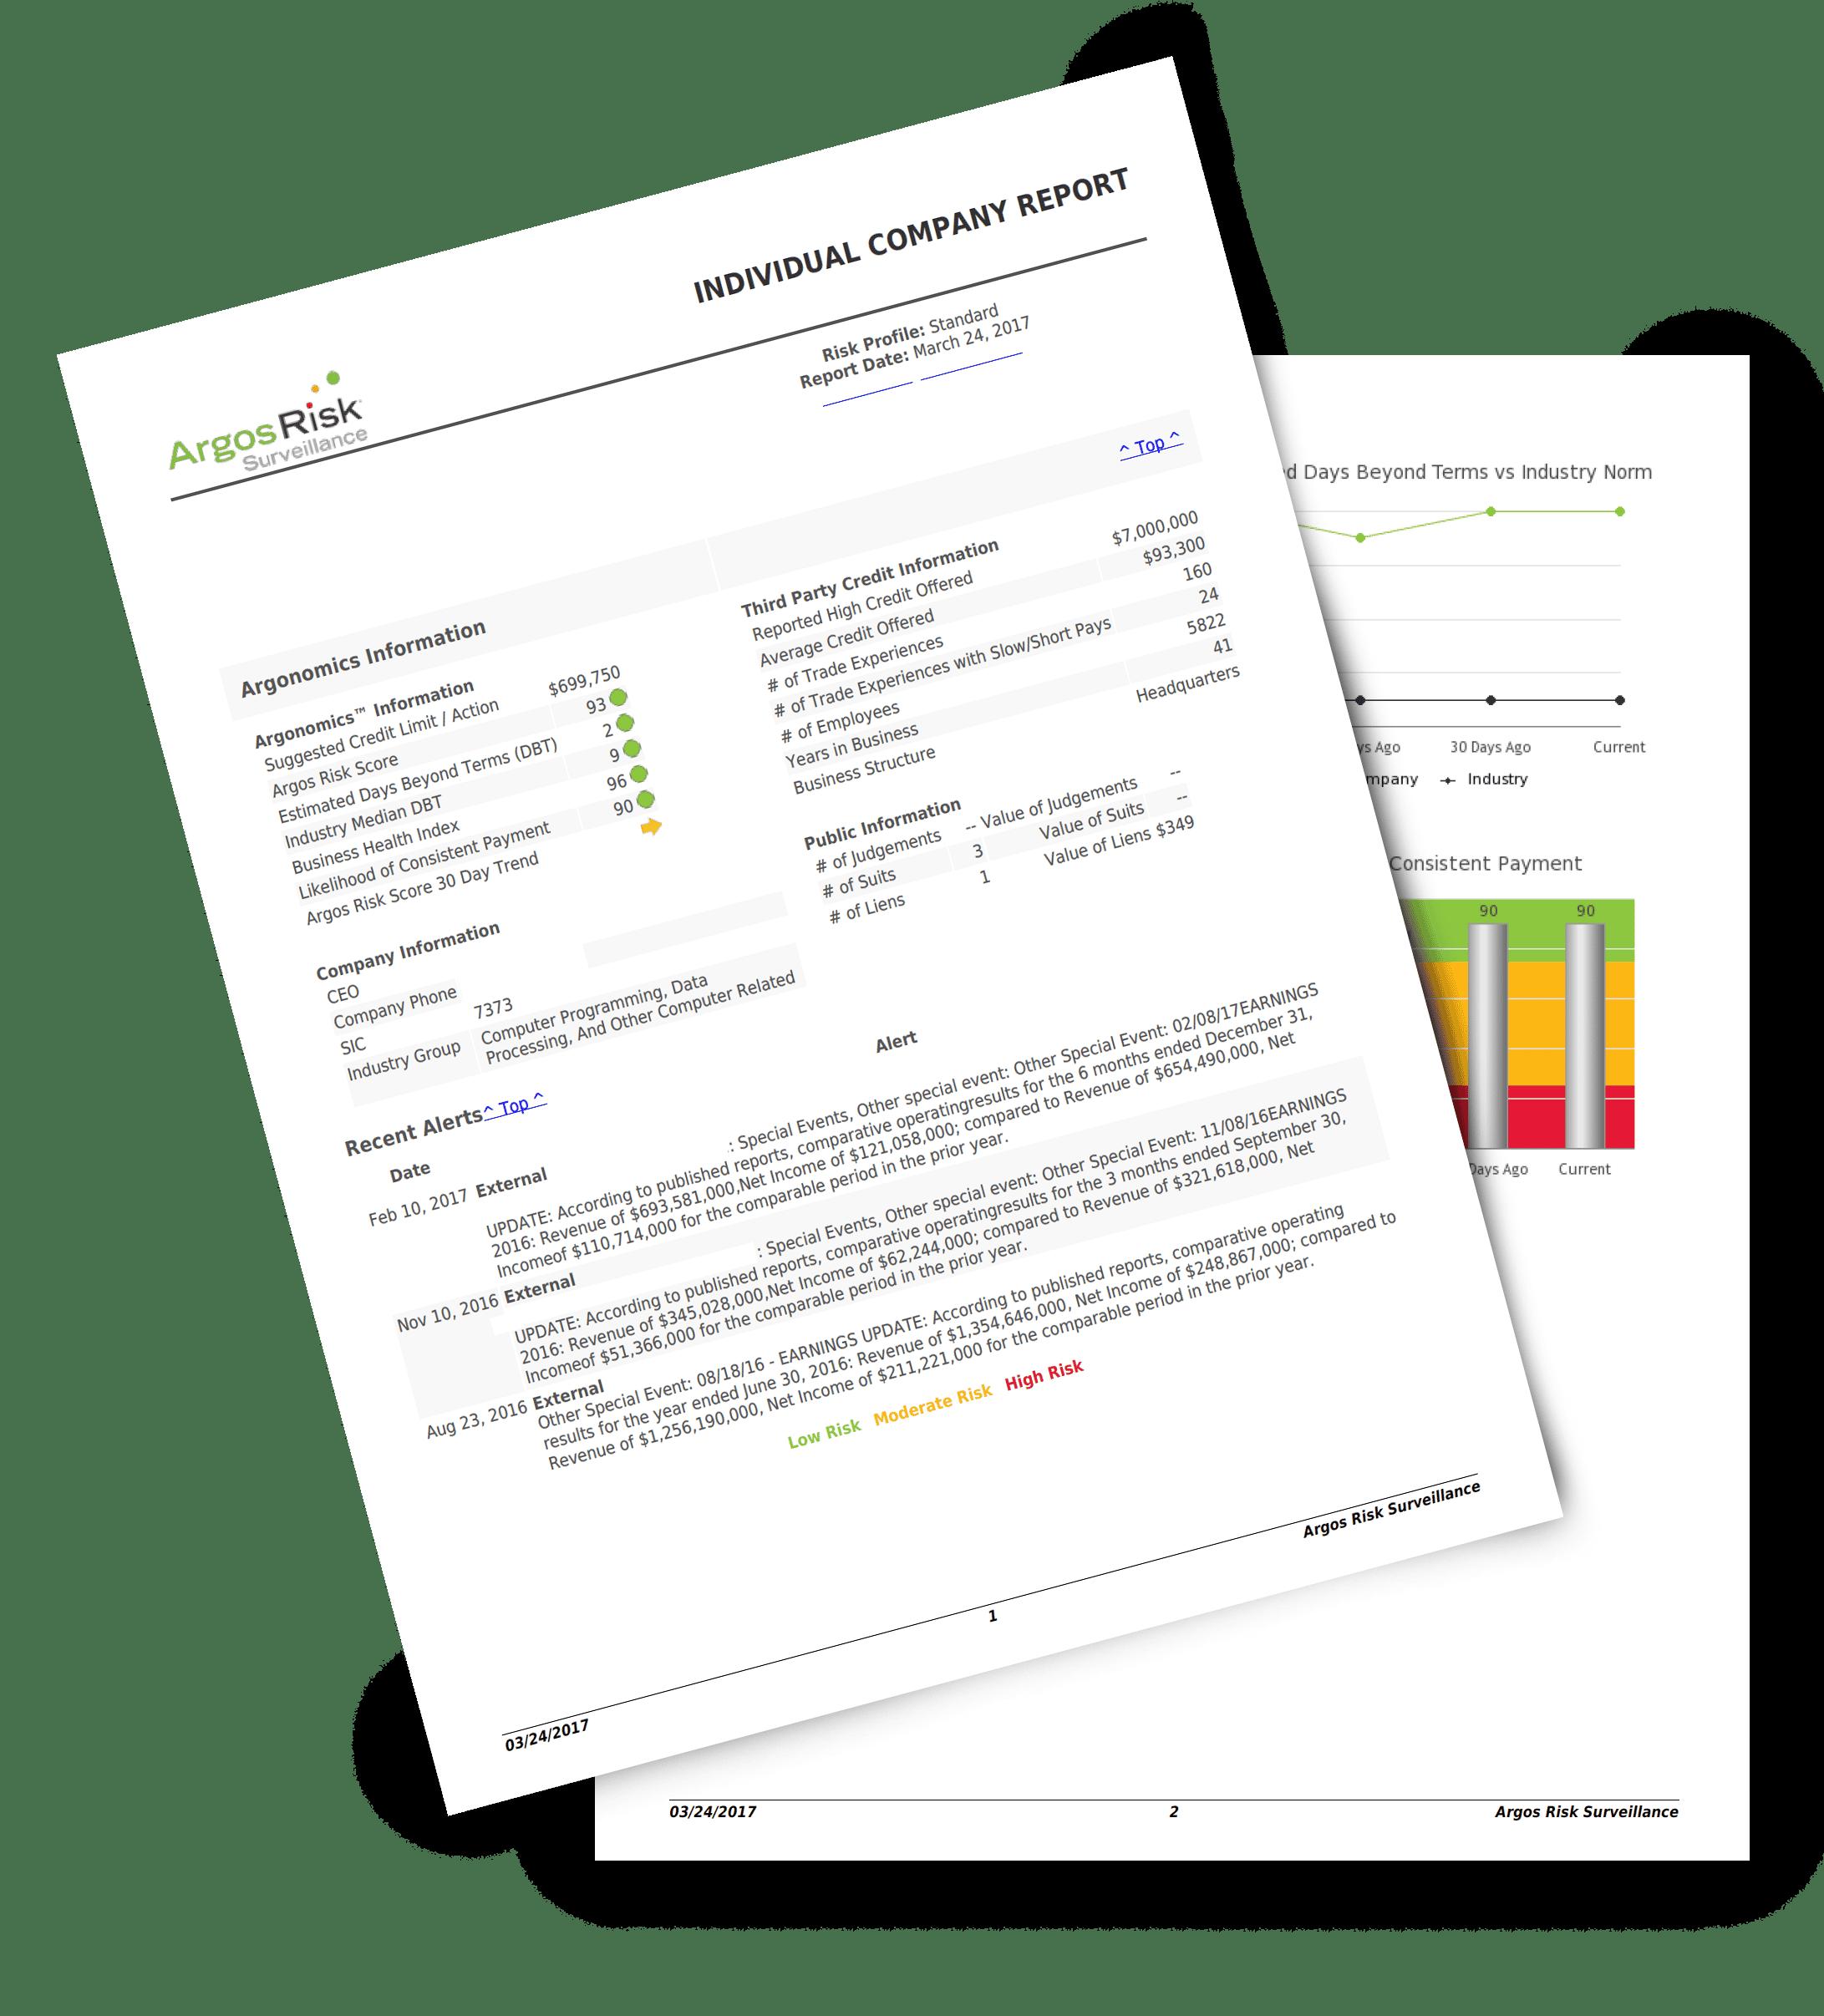 bank-credit-union-vendor-risk-monitoring-sample